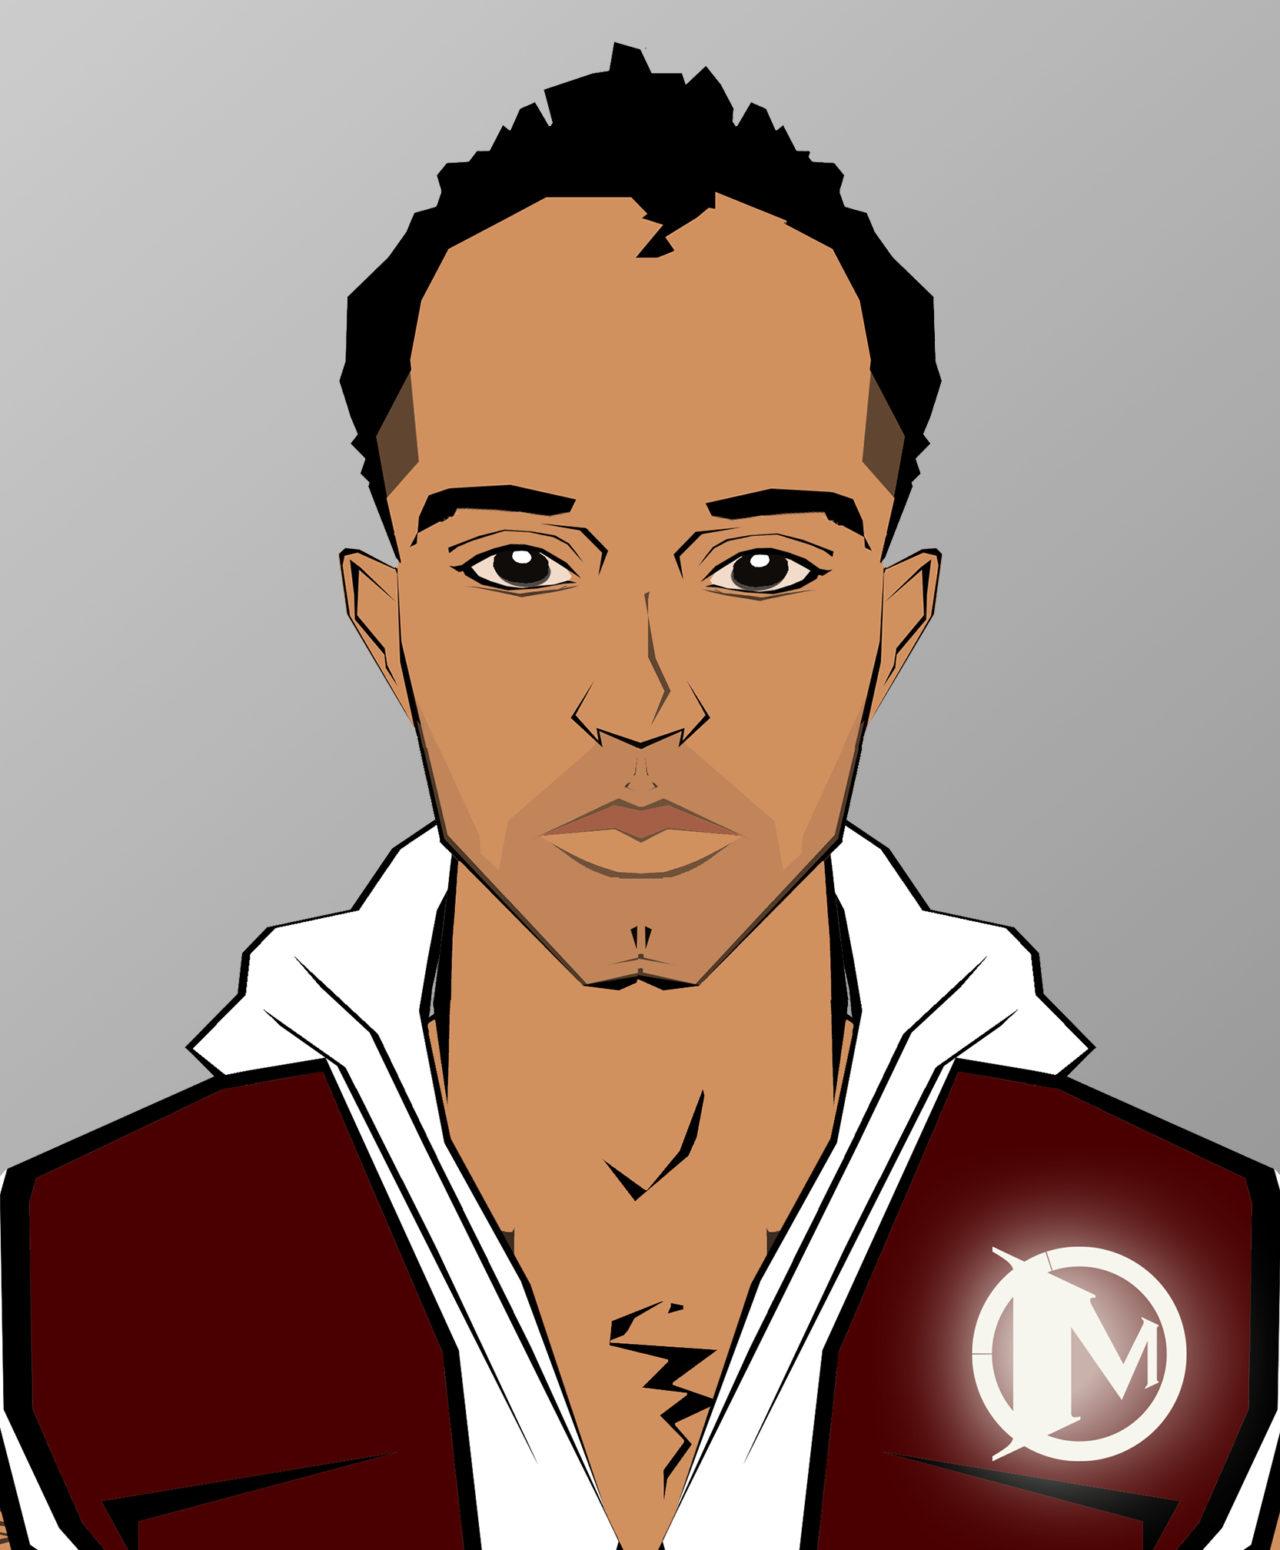 https://oziecargile.com/wp-content/uploads/2020/02/mims.character.majestic-increaser.portrait-1280x1550.jpg